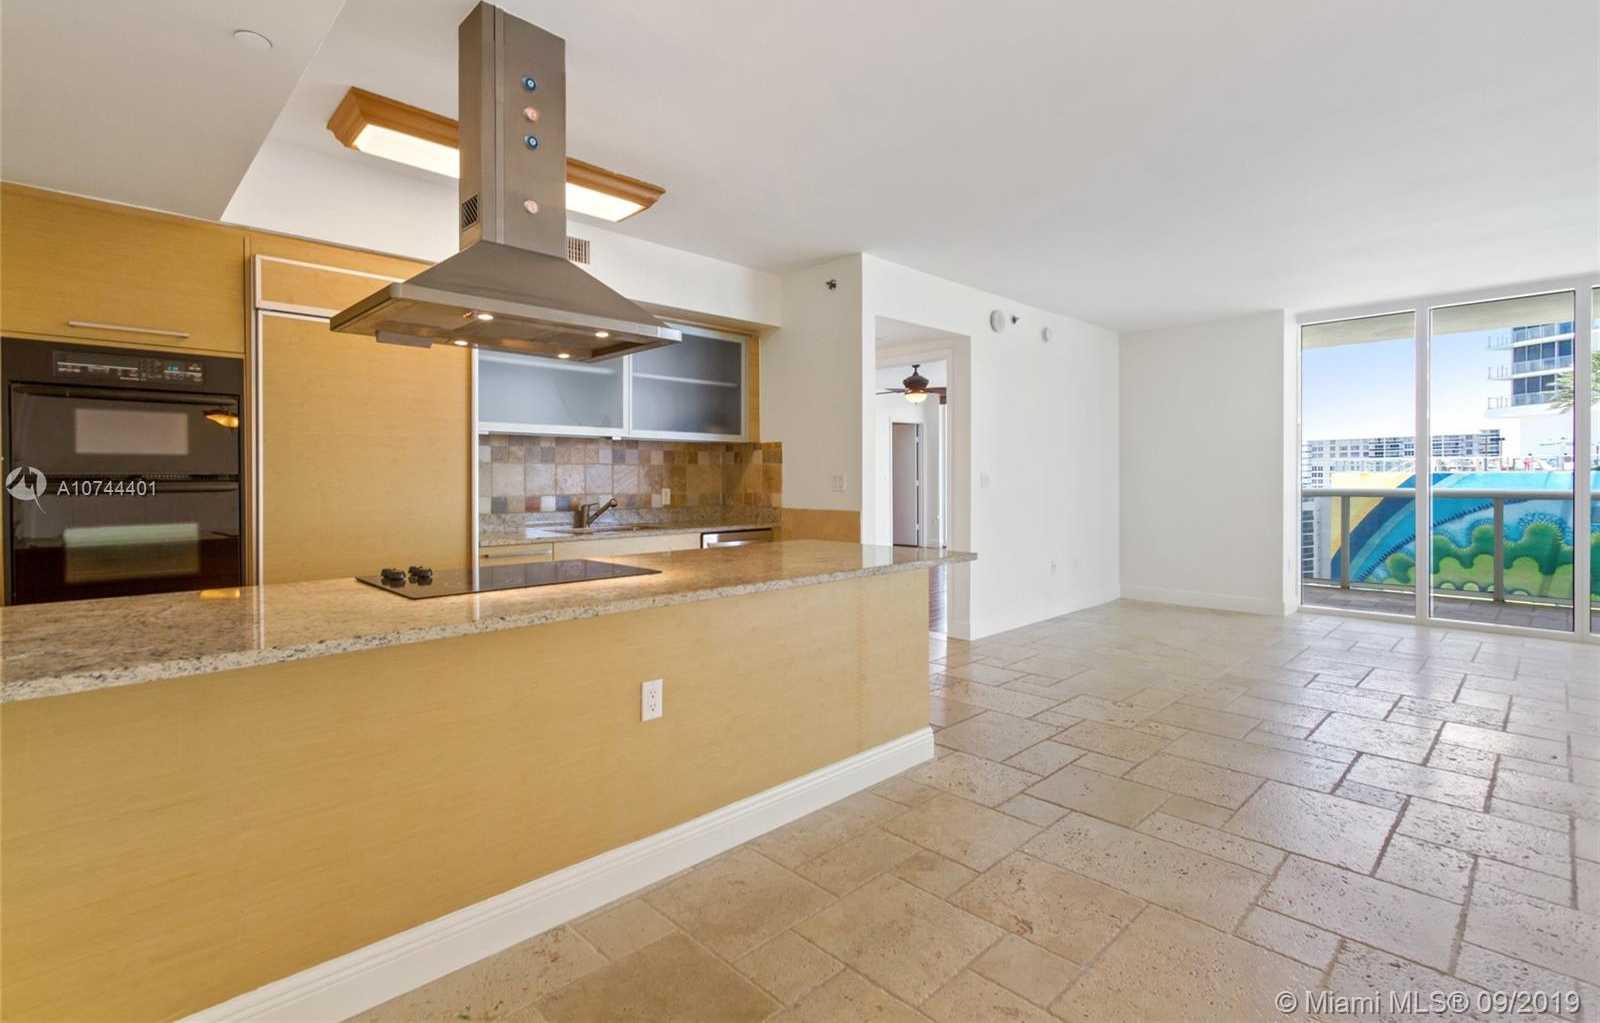 $725,000 - 2Br/2Ba -  for Sale in Beach Club Three Condo, Hallandale